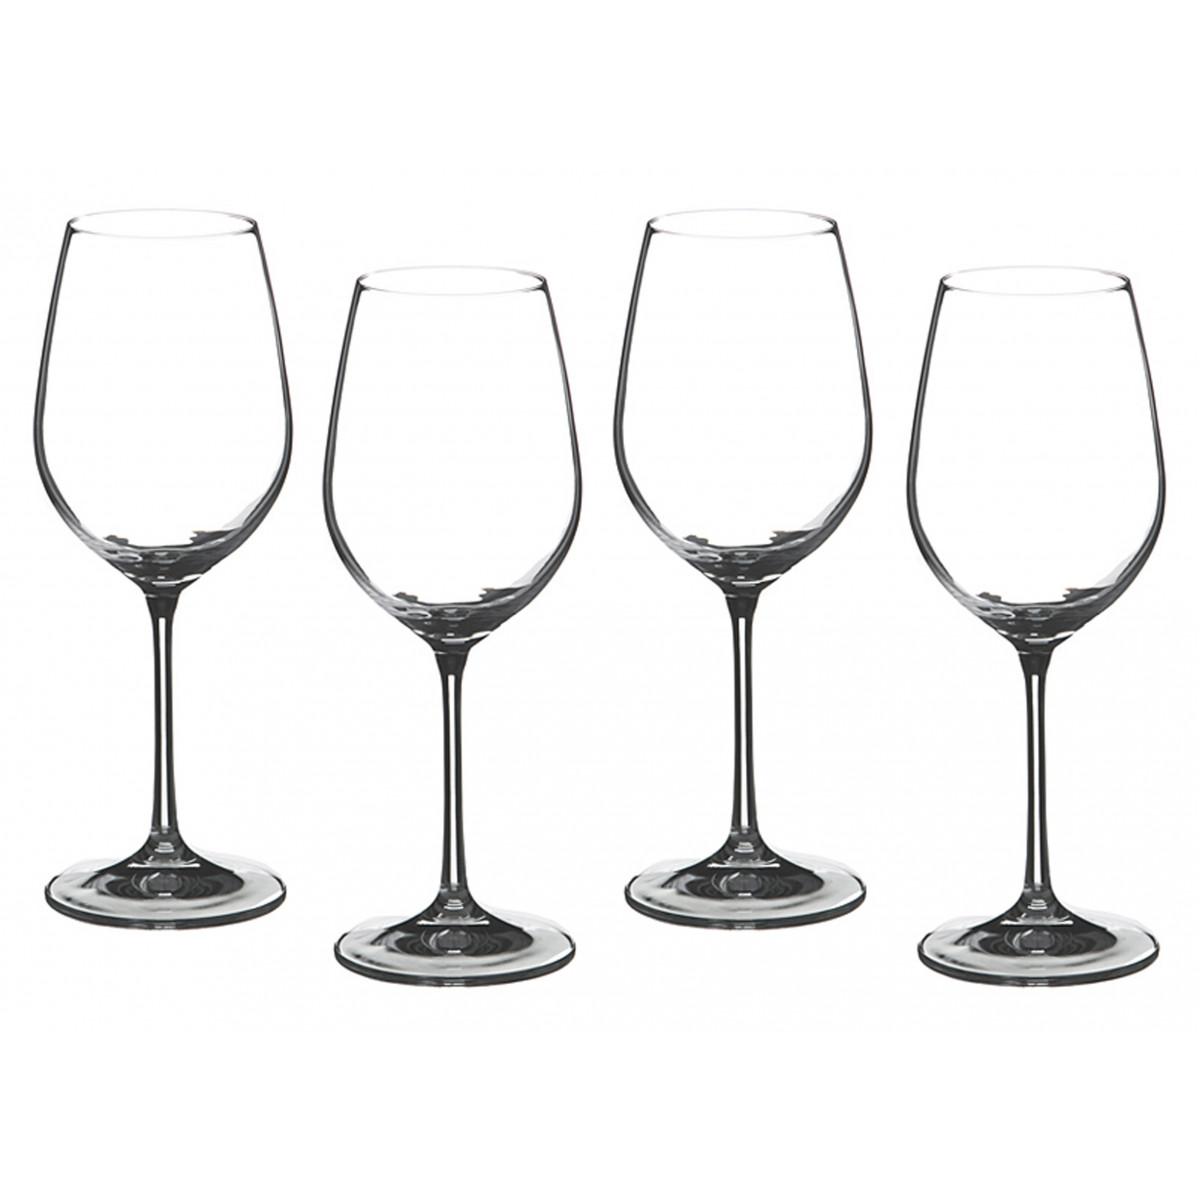 {} Bohemia Crystal Набор бокалов для вина Claud  (23 см - 4 шт) набор для кофе crystal bohemia mokko 4 предмета